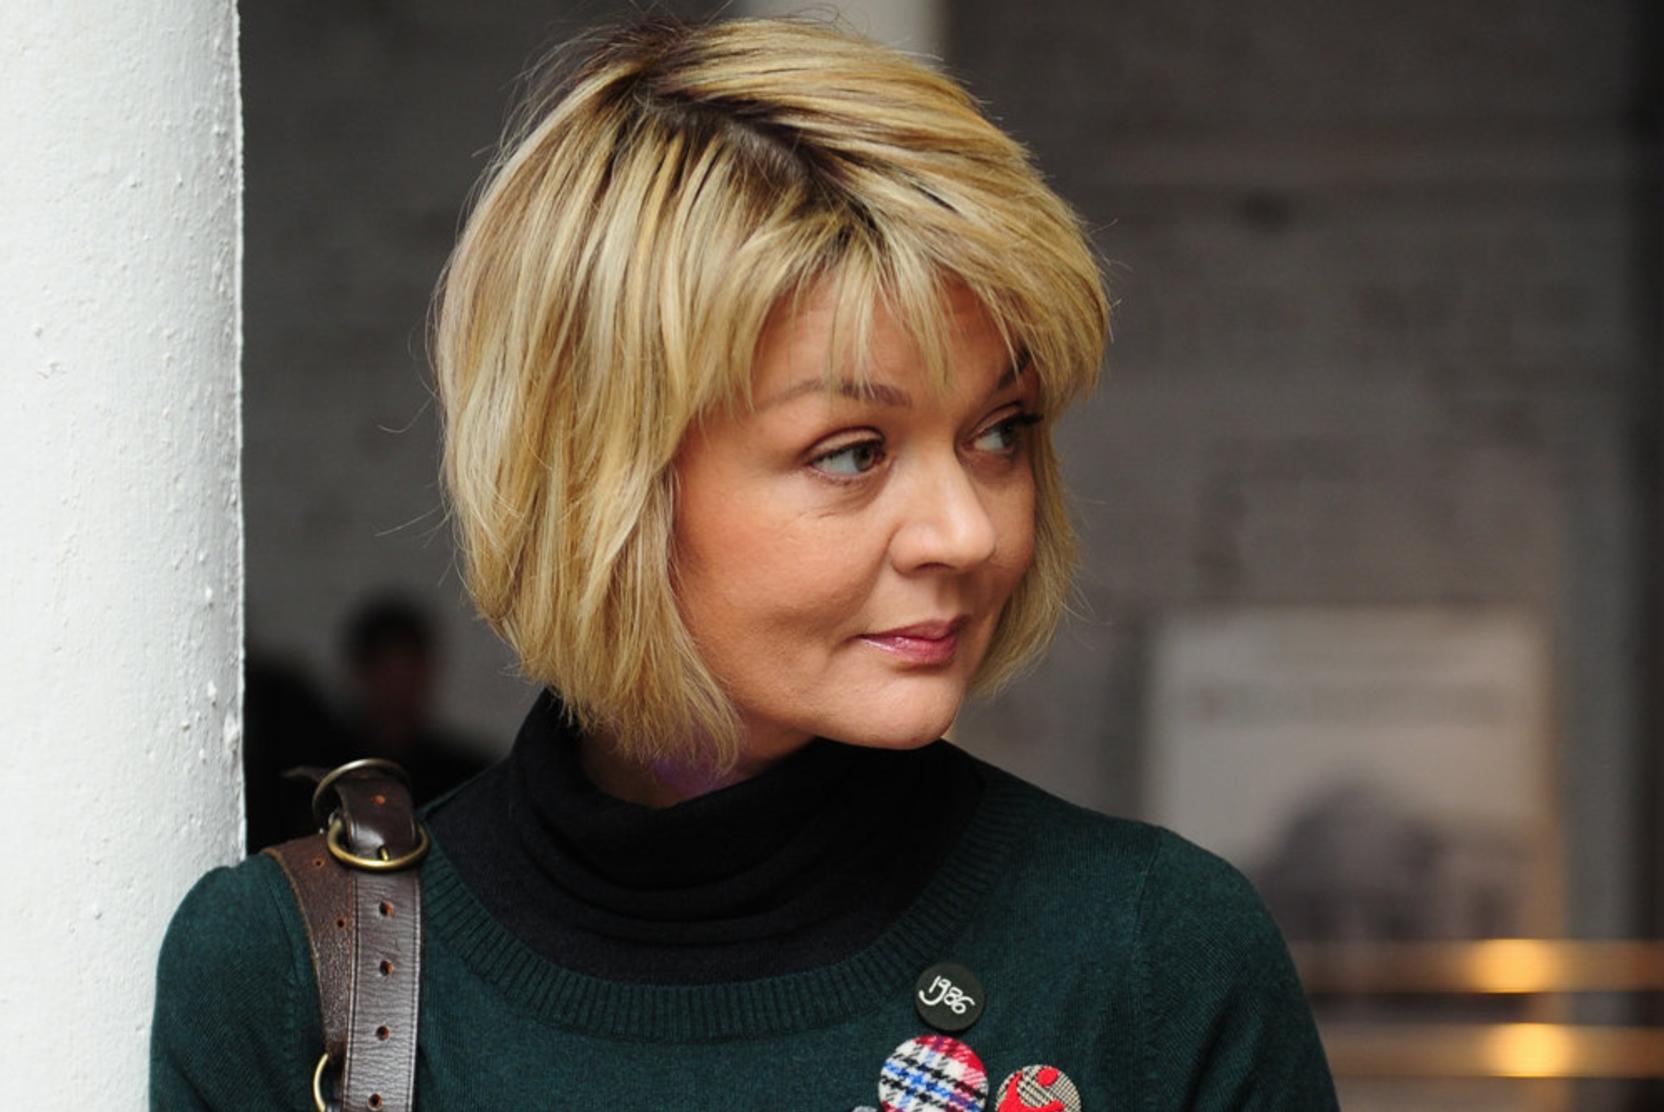 Юлия меньшова молодая фото